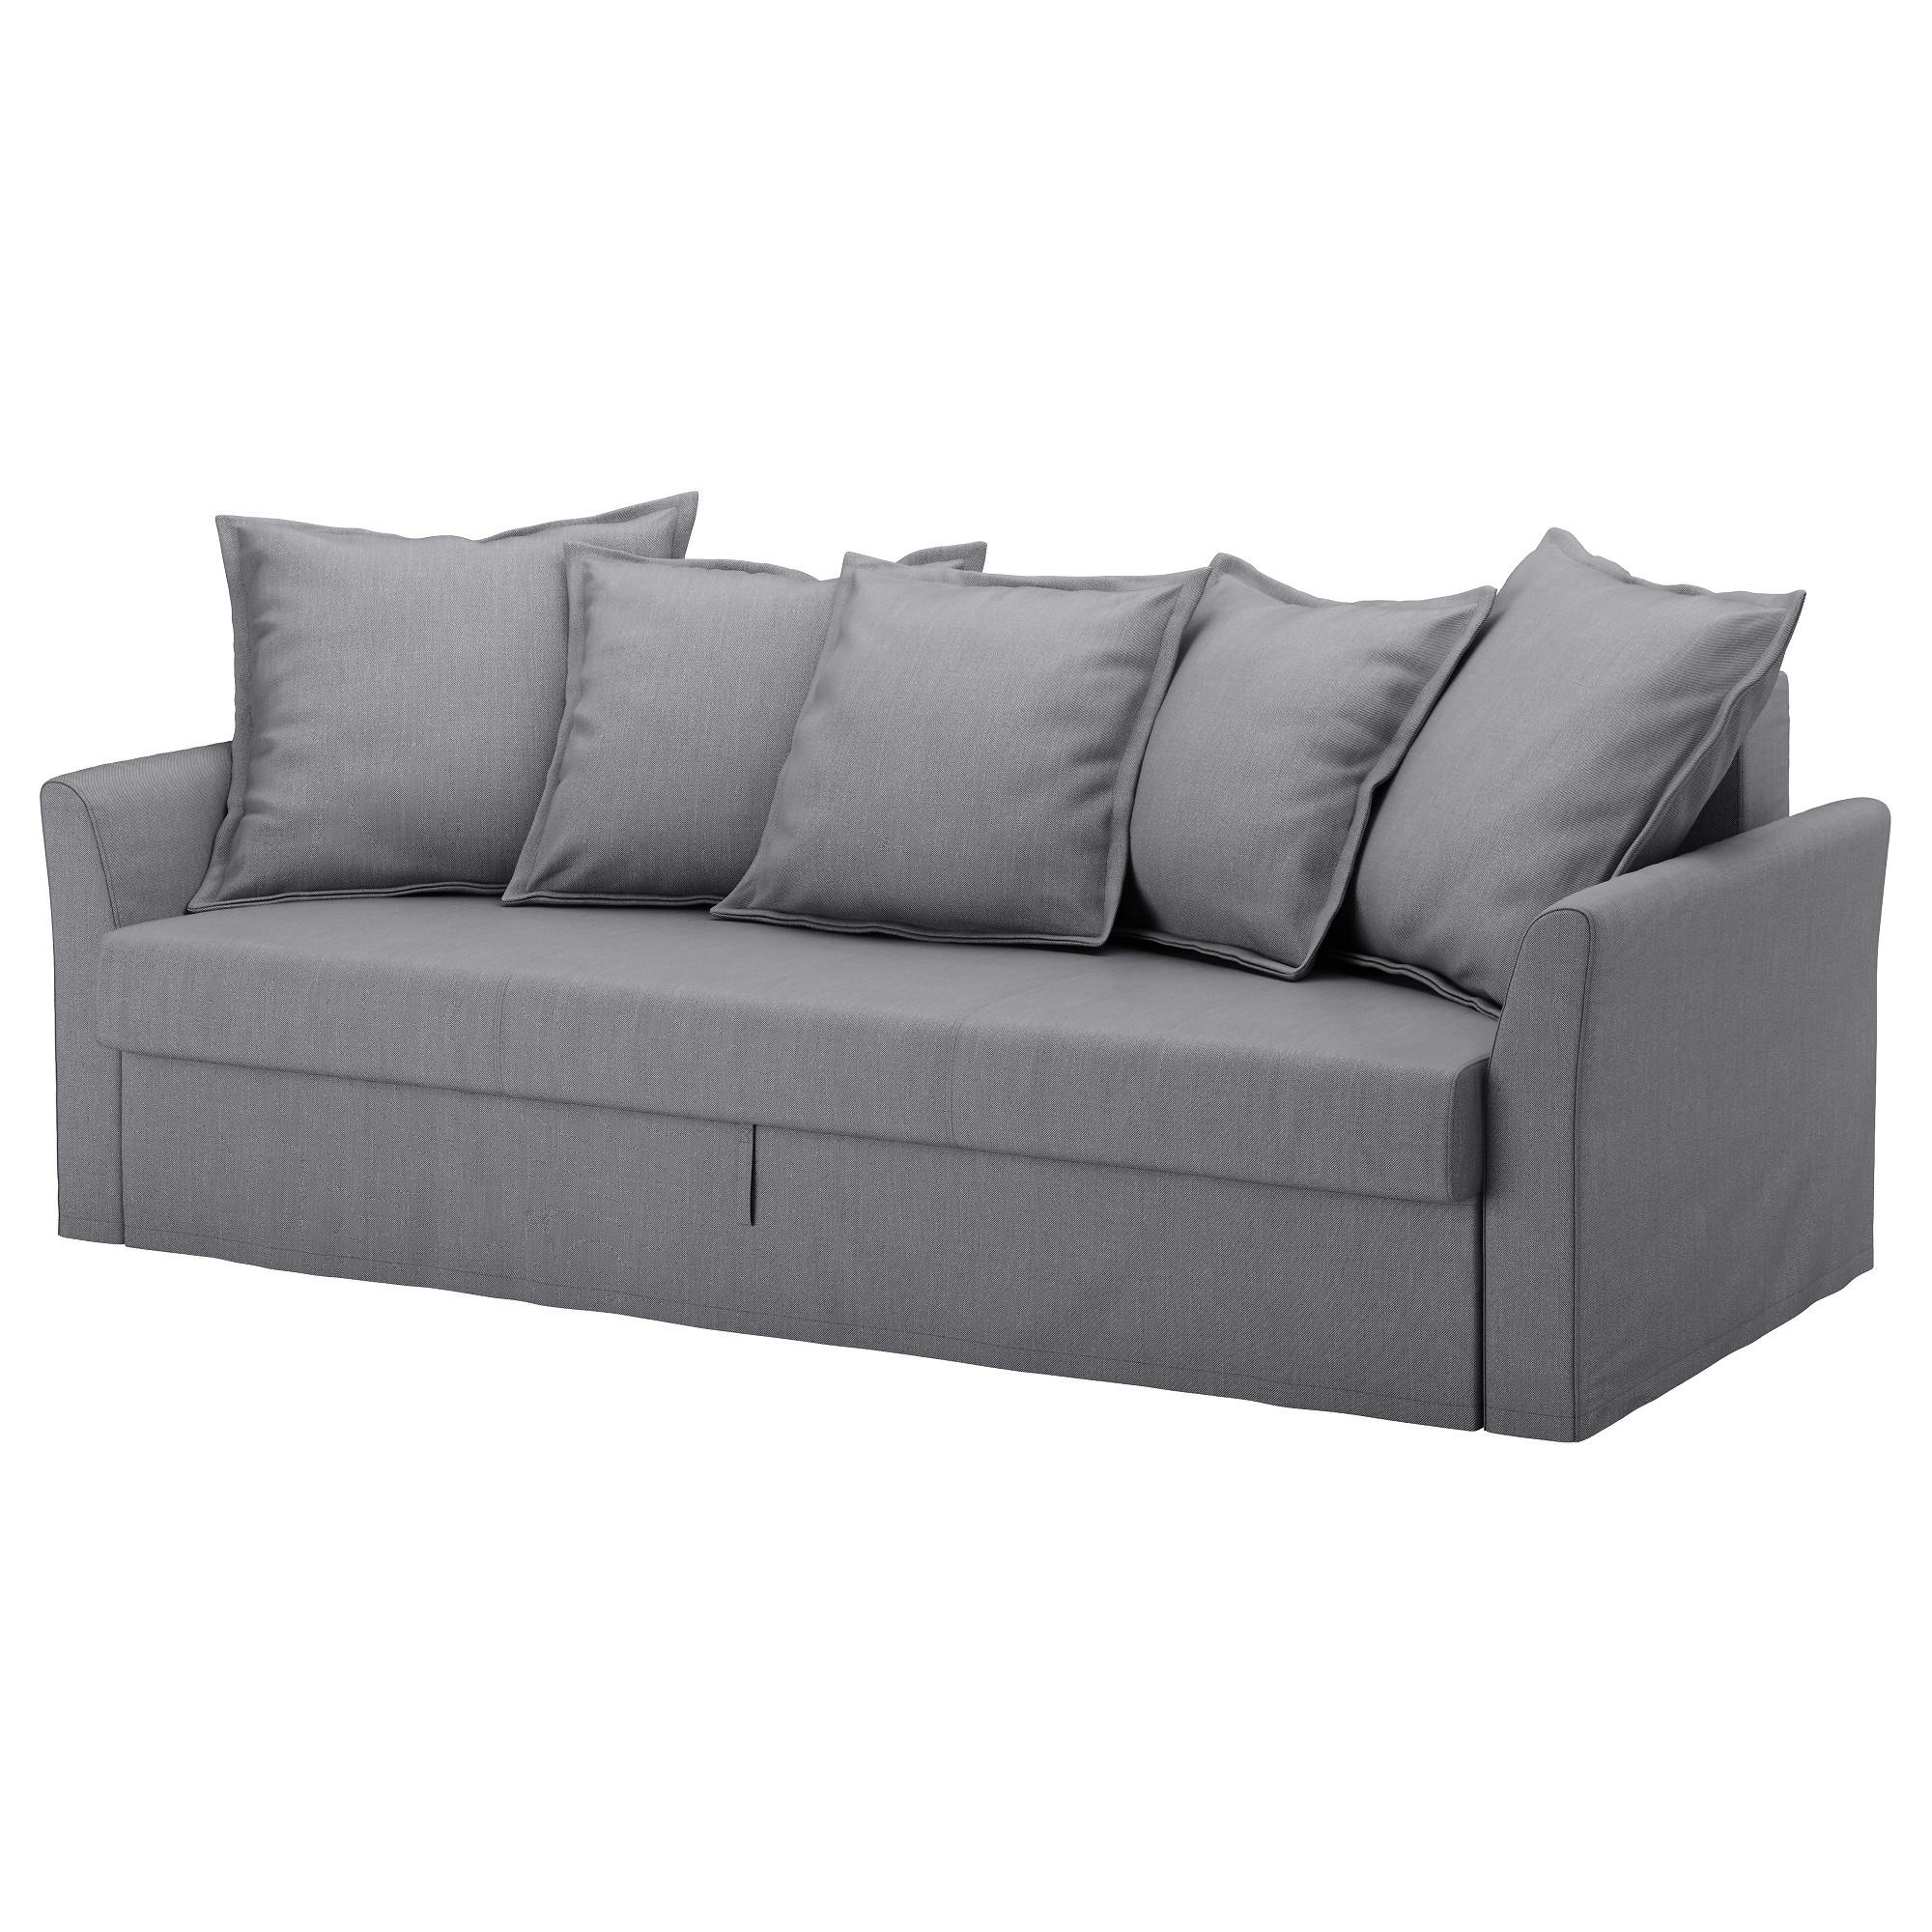 20 Top Sleeper Sofas Ikea